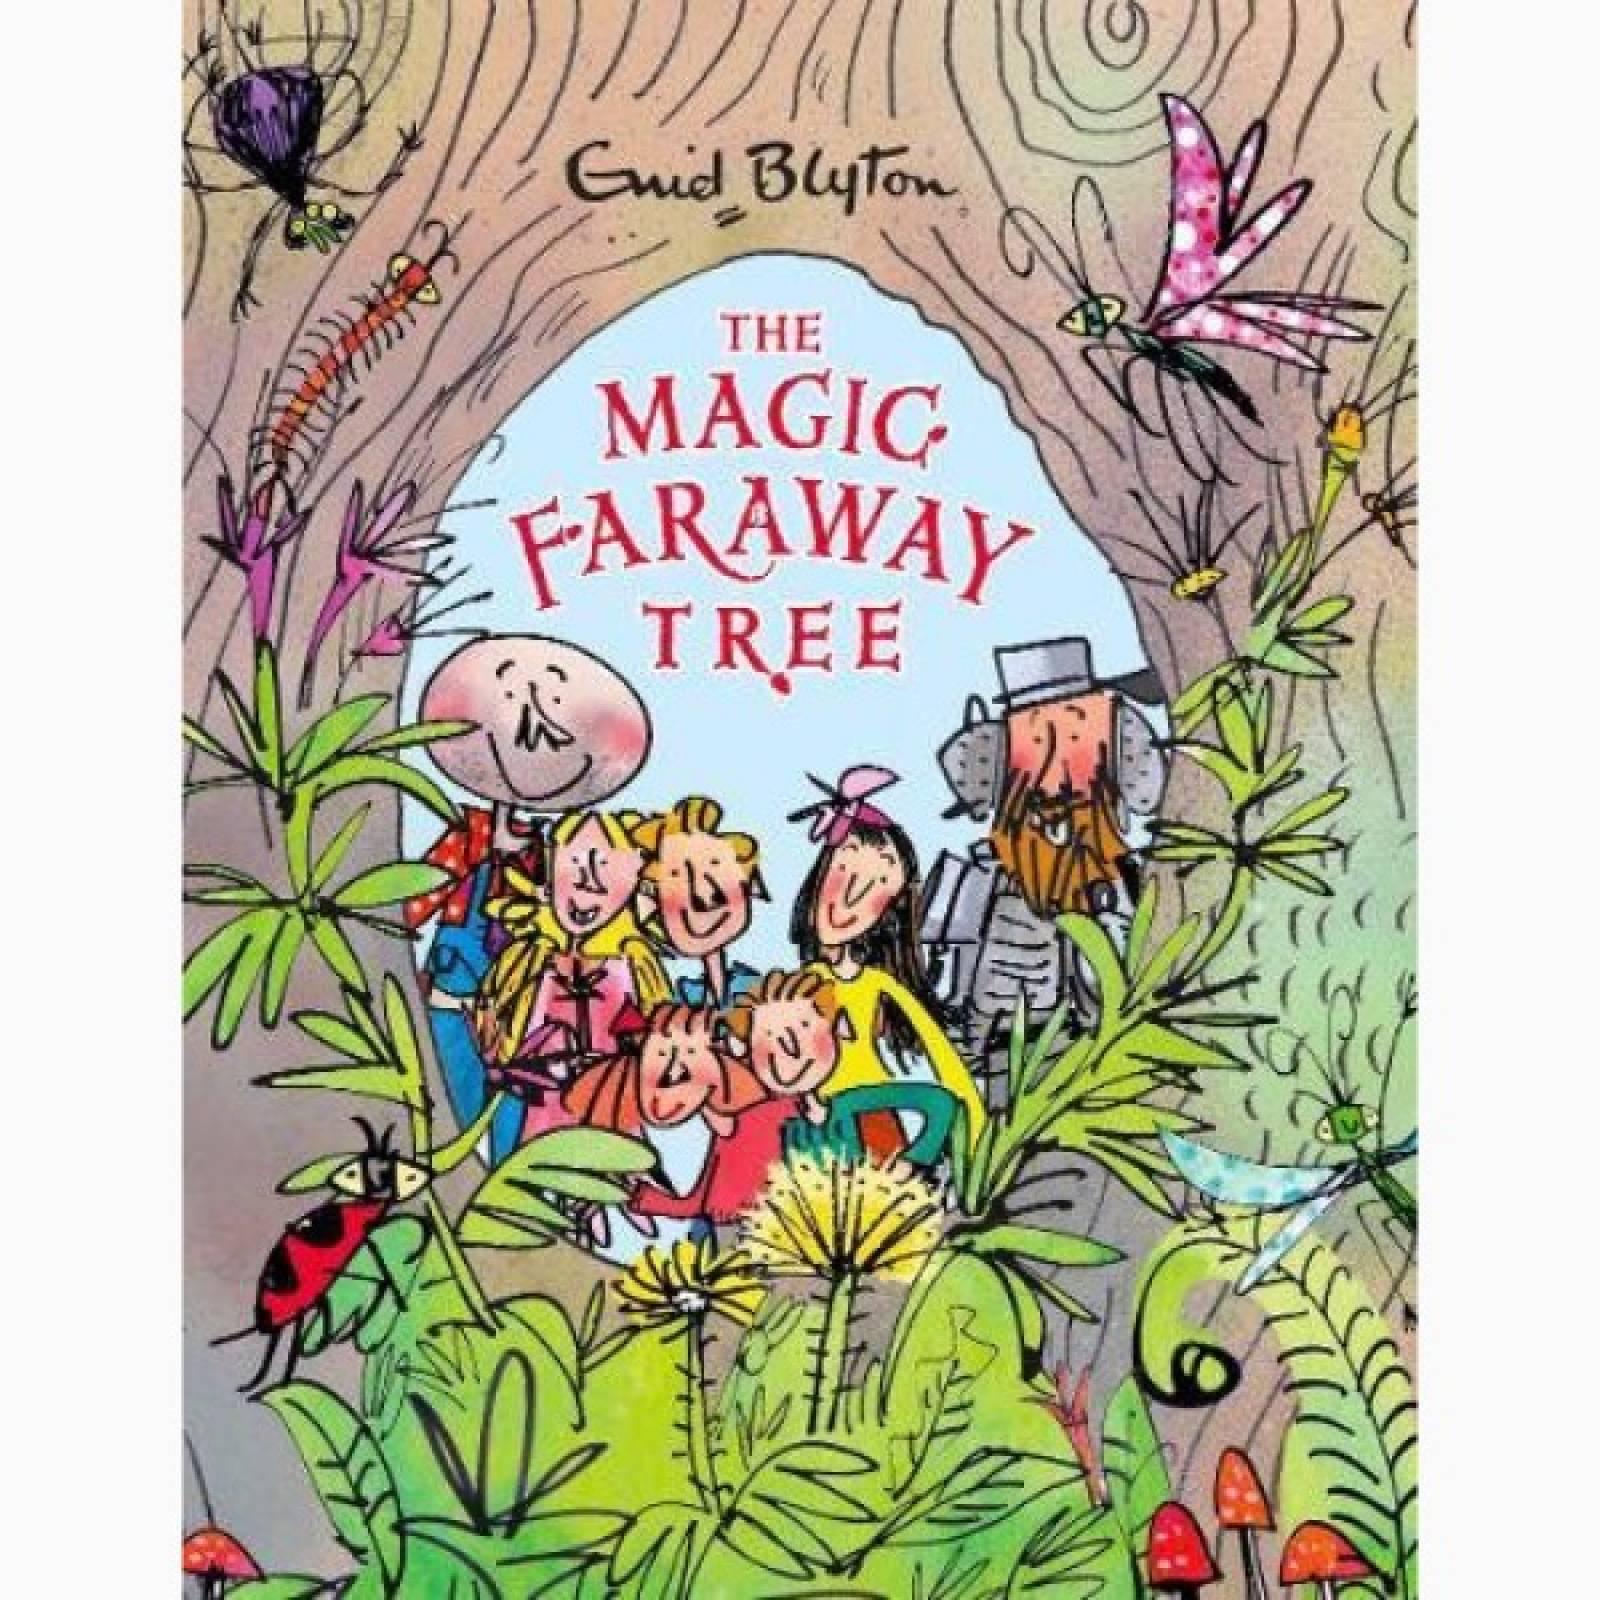 The Magic Faraway Tree - Hardback Book Gift Edition